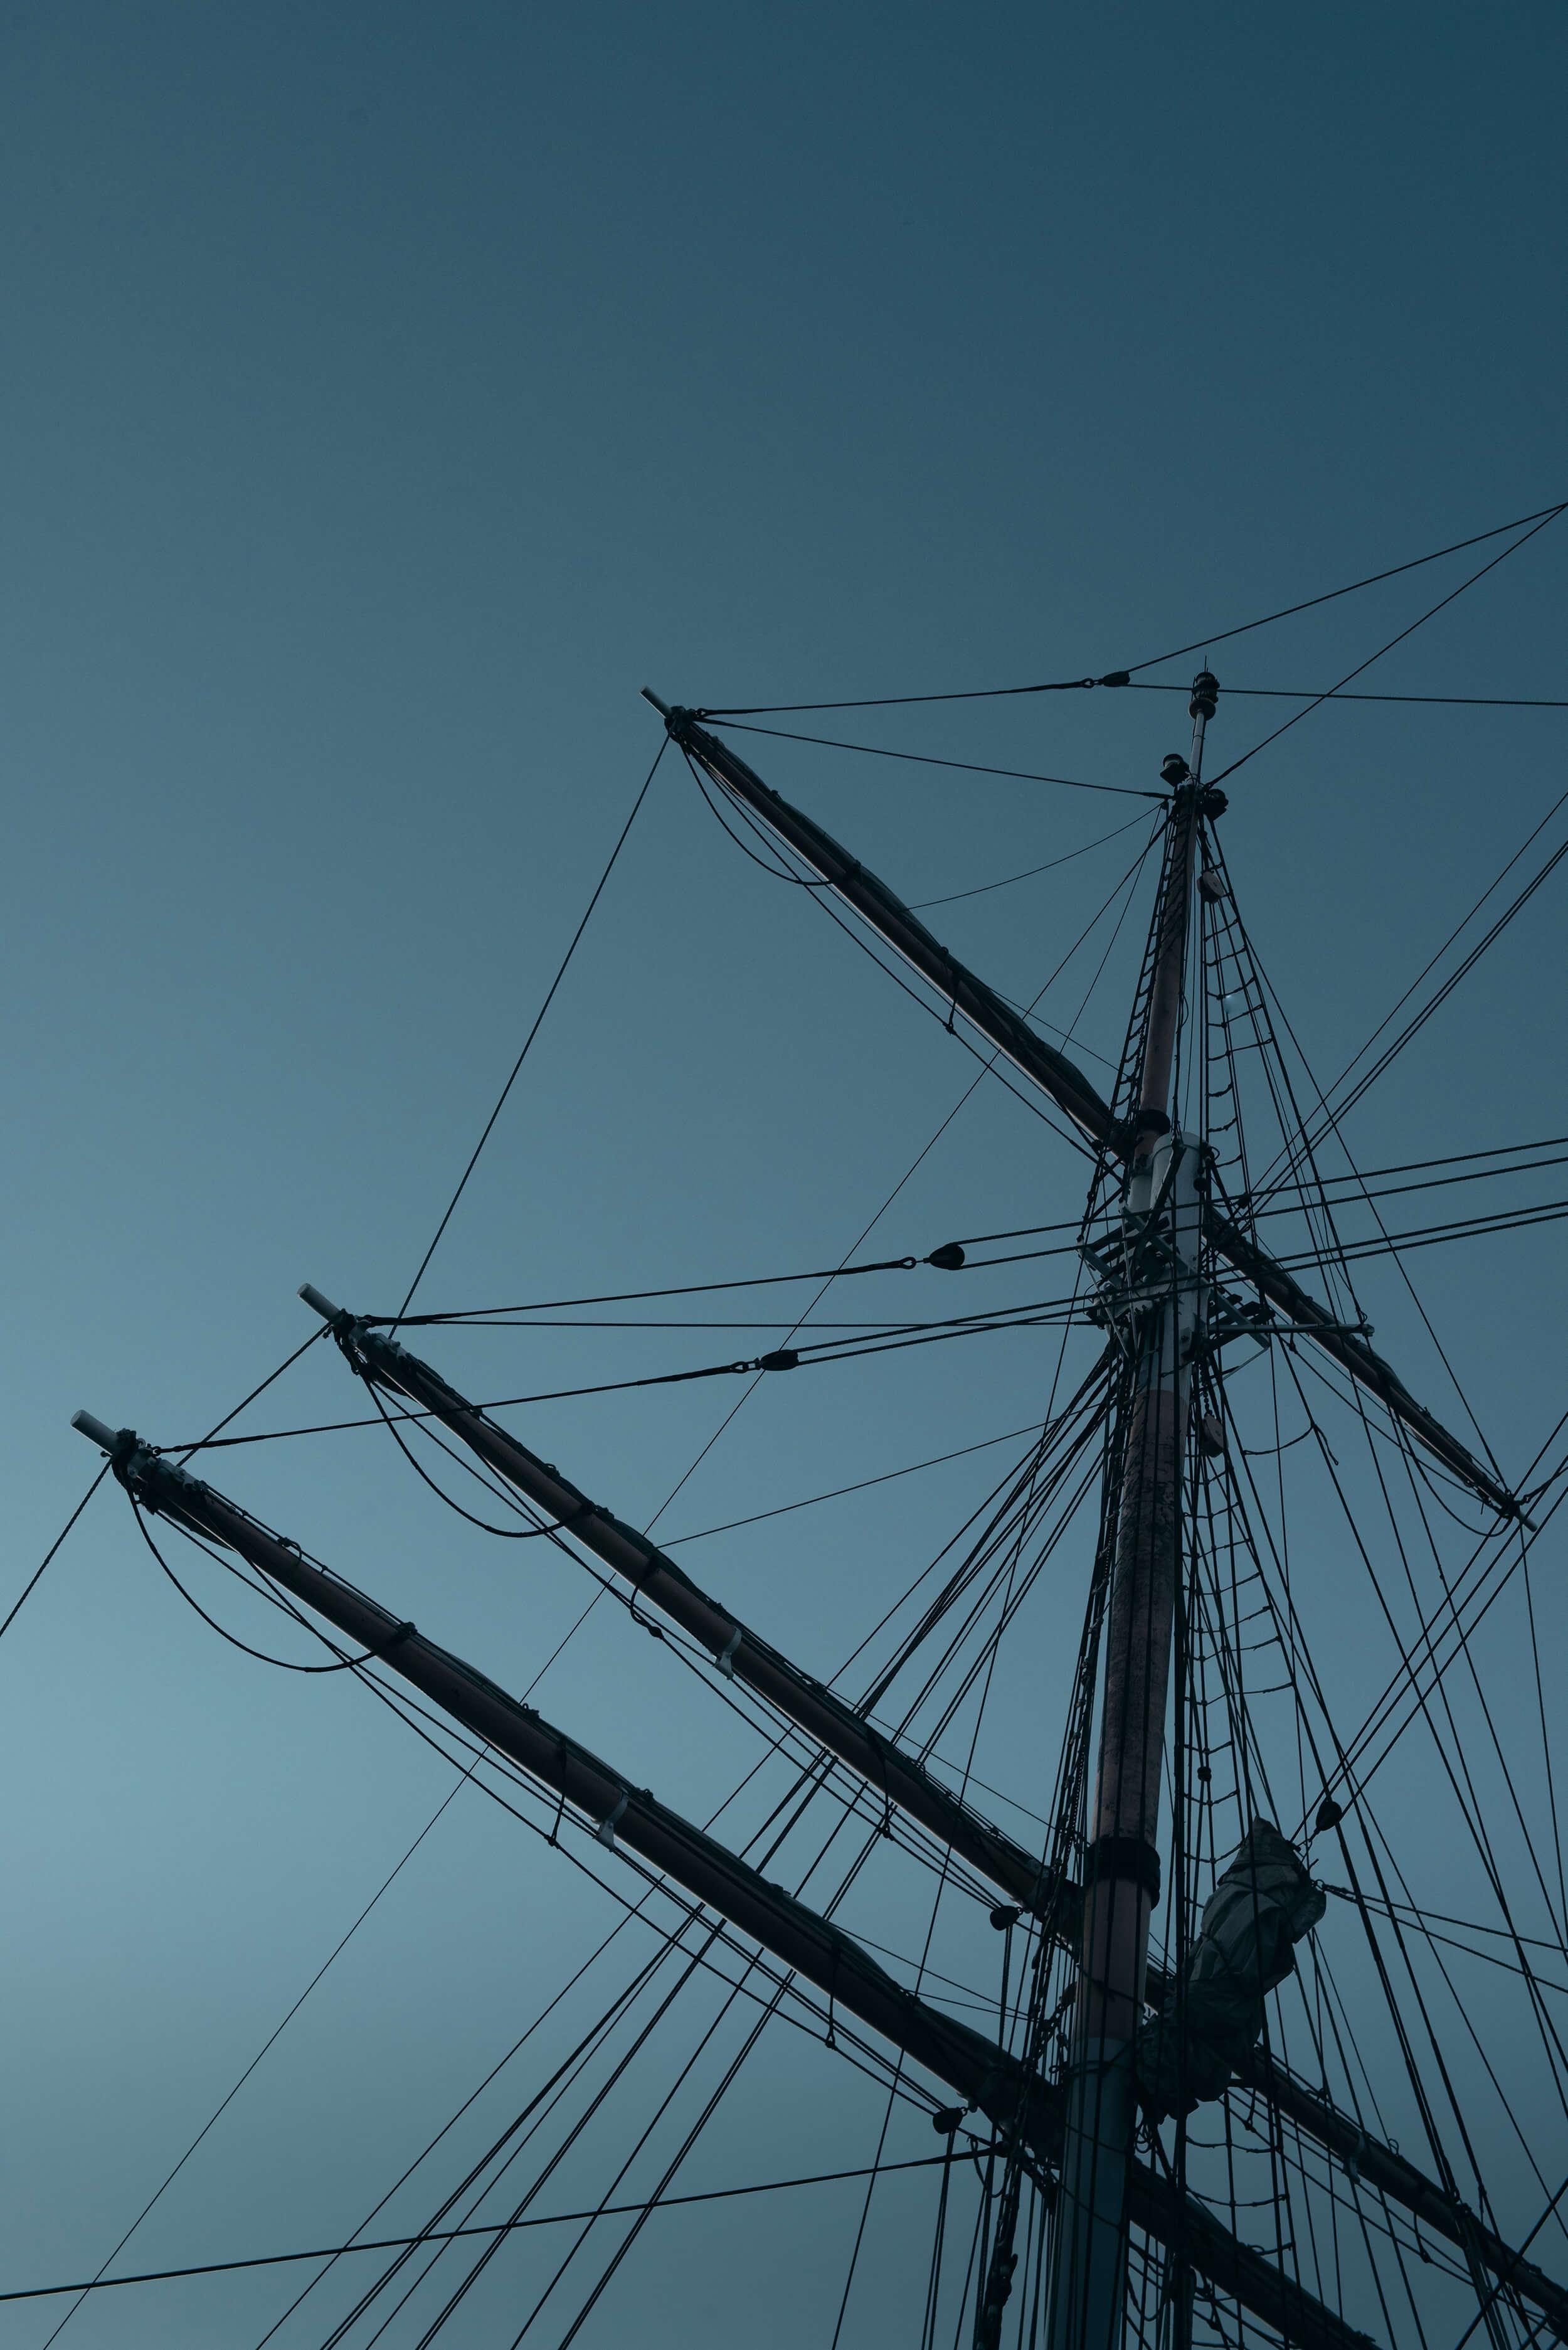 A pirate ships mast